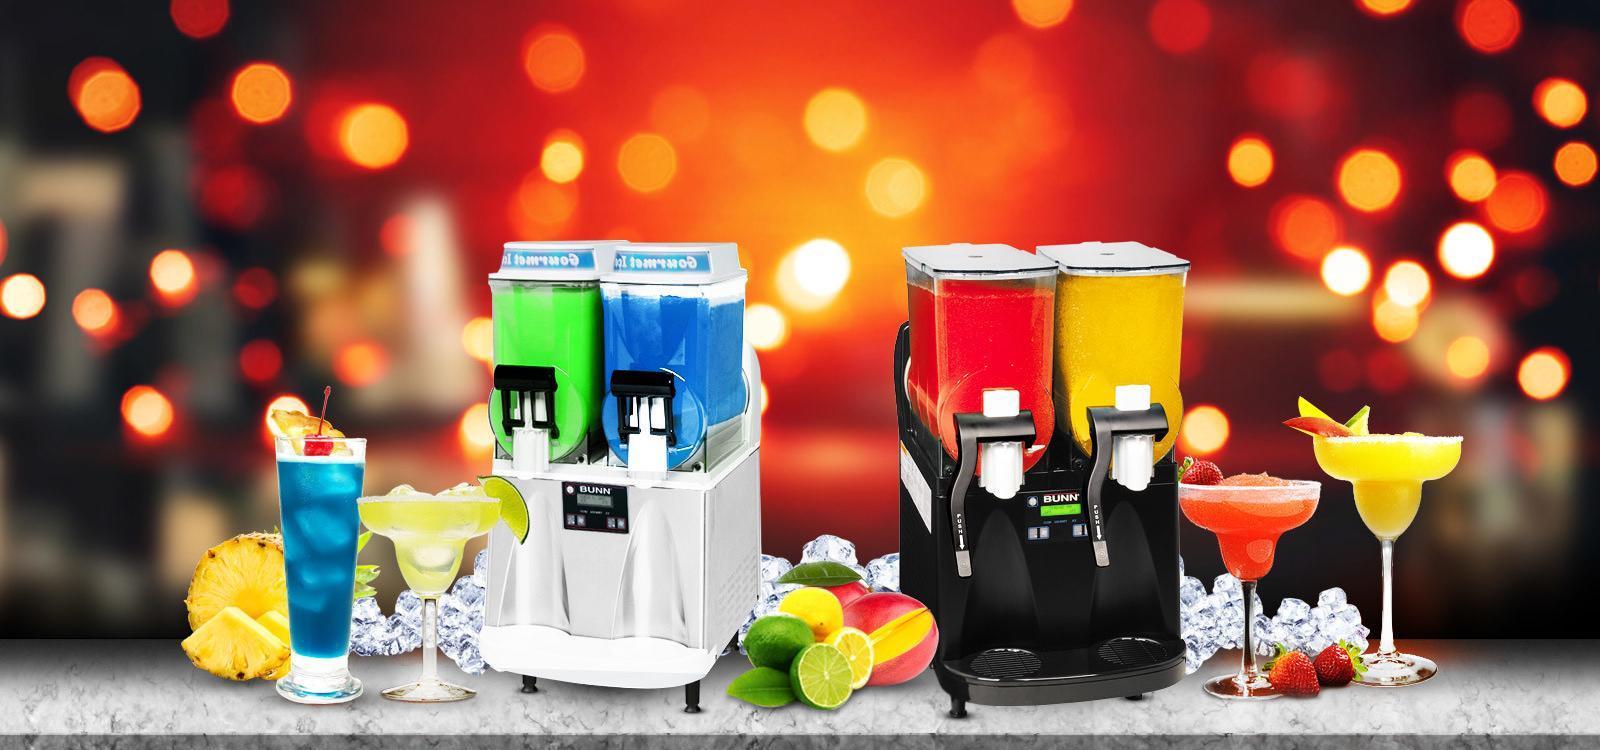 Frozen Drink Mixes by Swirled Ice - Slush Mix, Margarita Mix